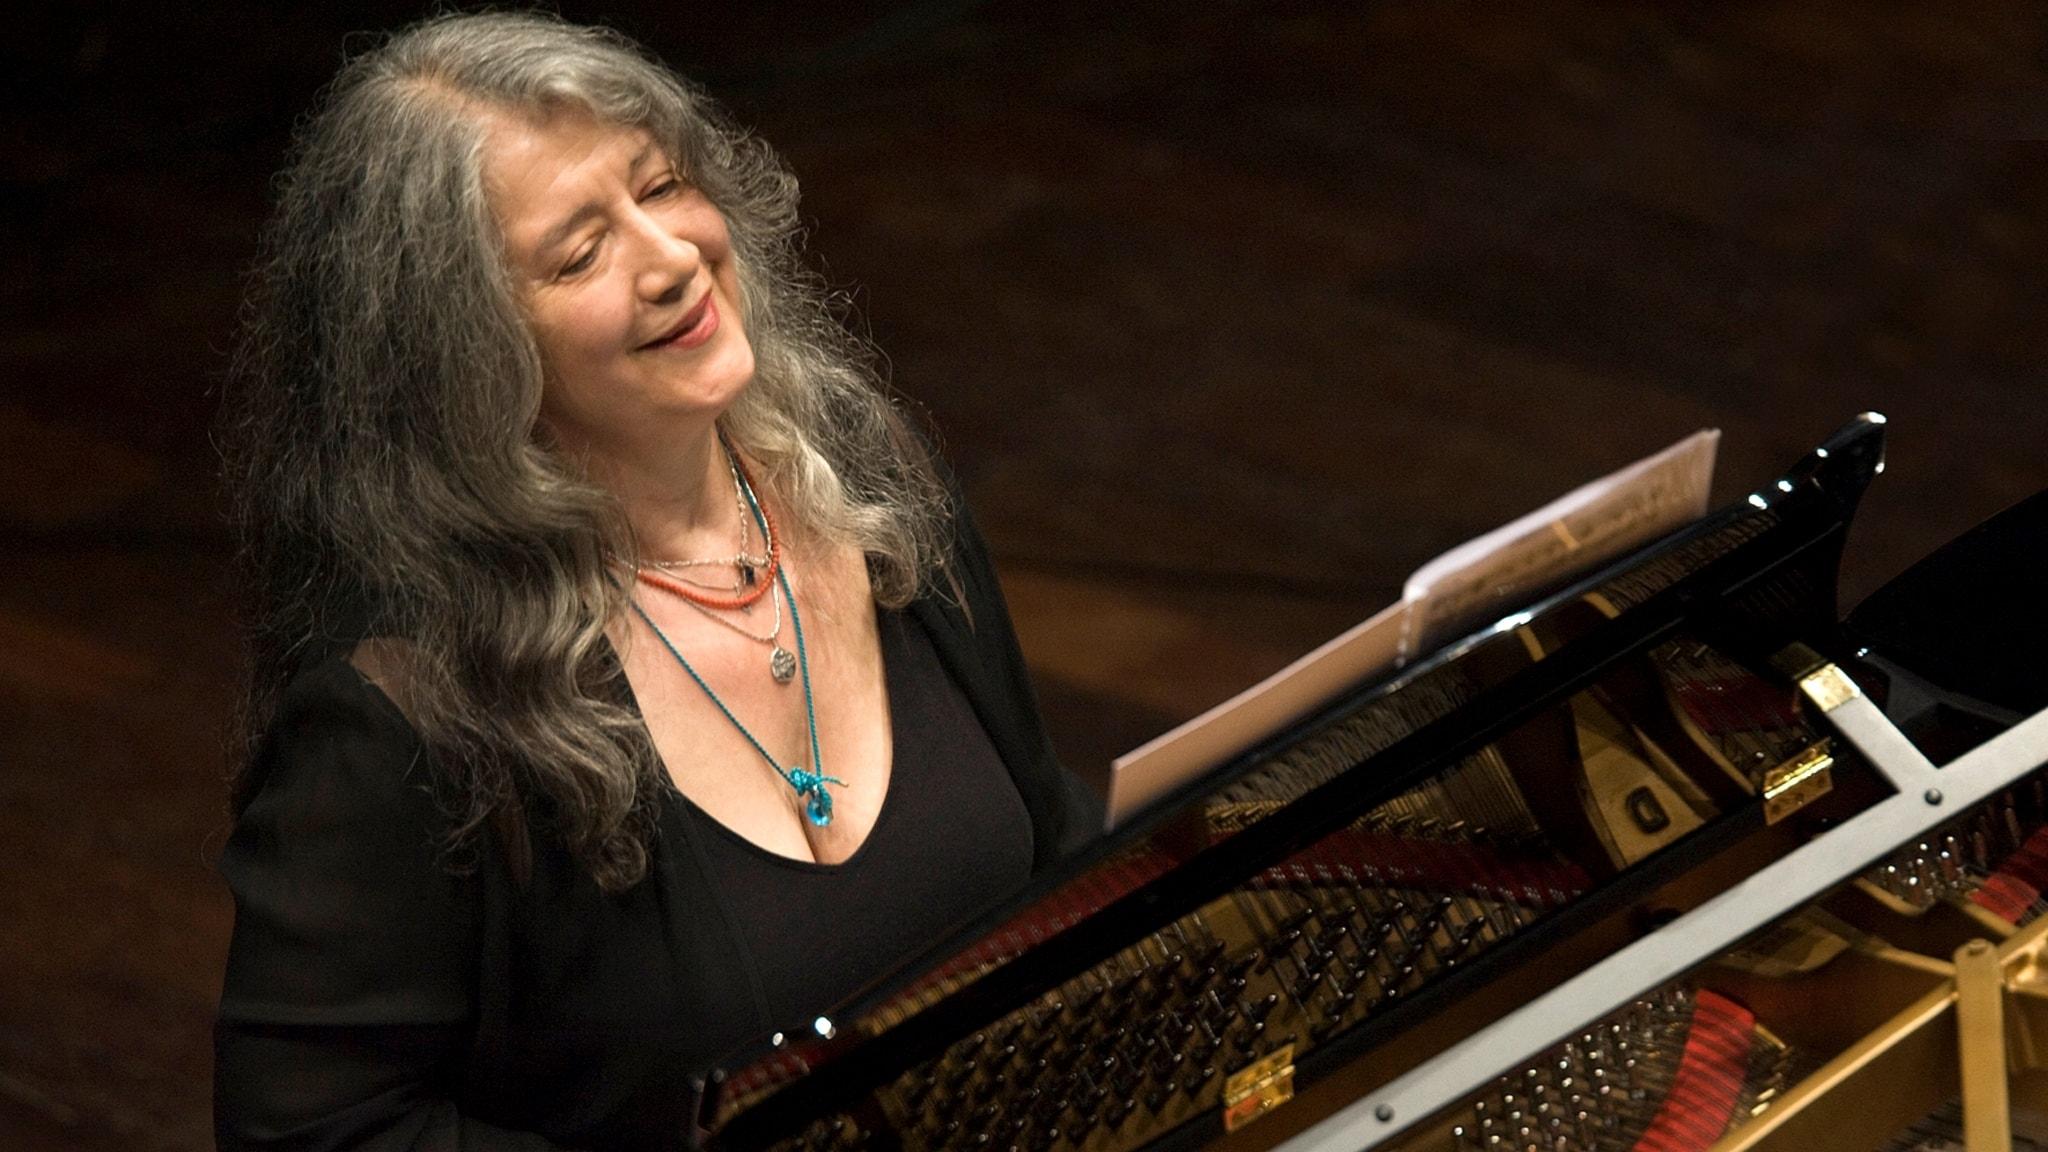 KONSERT: Martha Argerich spelar Beethoven och Saint-Saëns